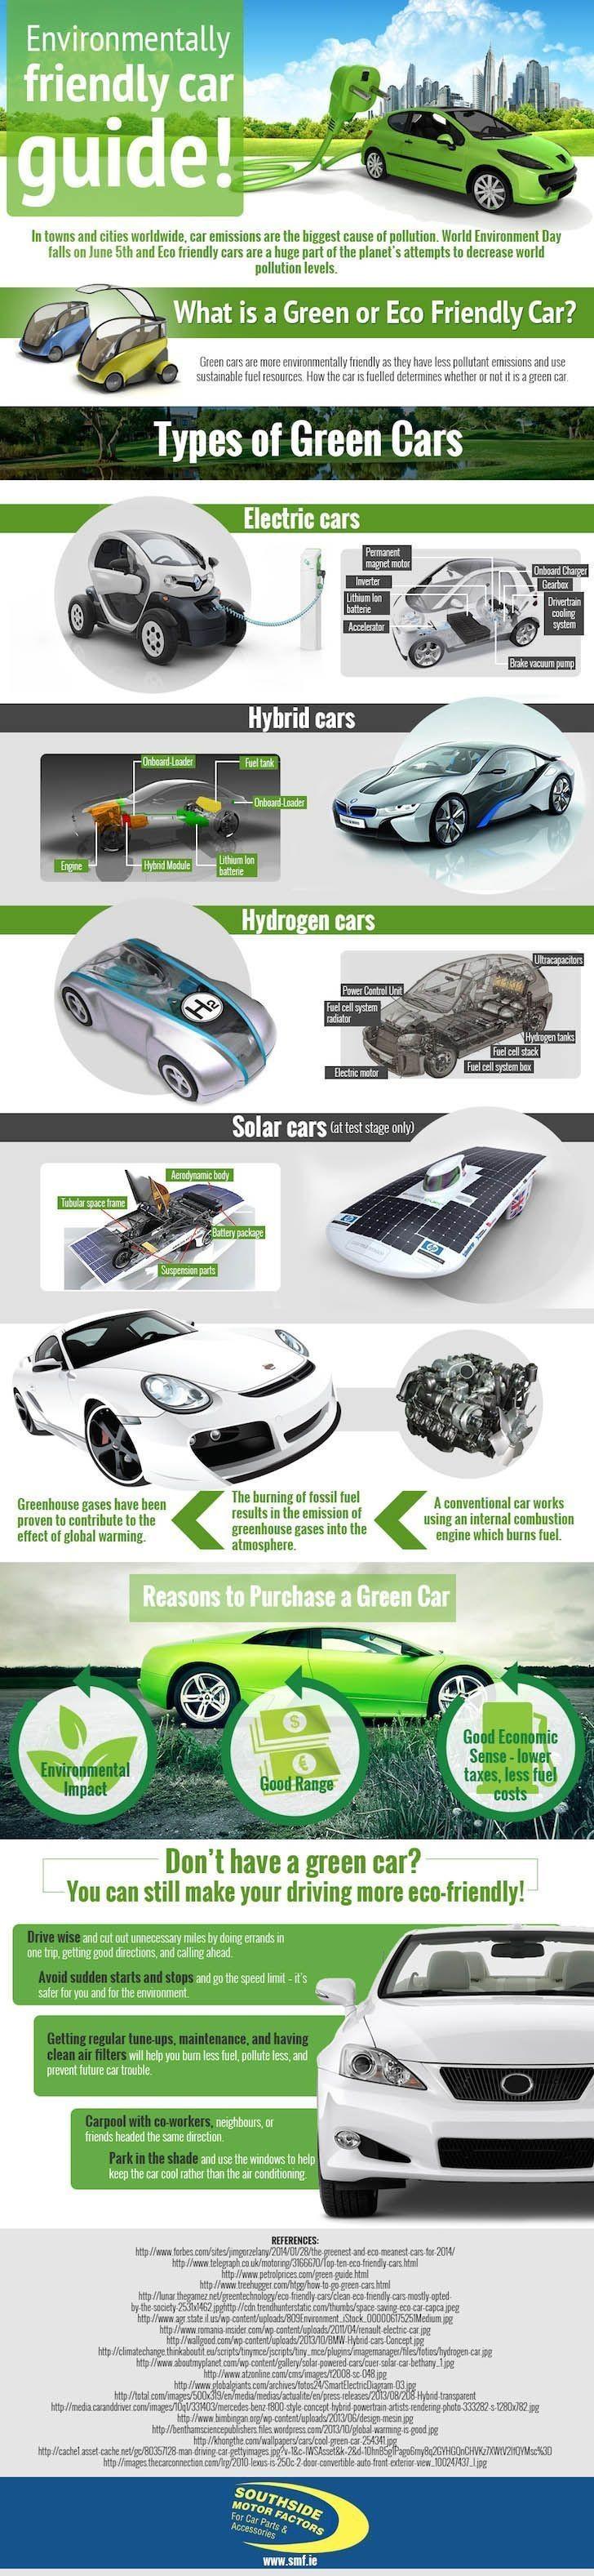 Hybrid Car Diagram 22 Best Electric Vehicles Images On Pinterest Of Hybrid Car Diagram